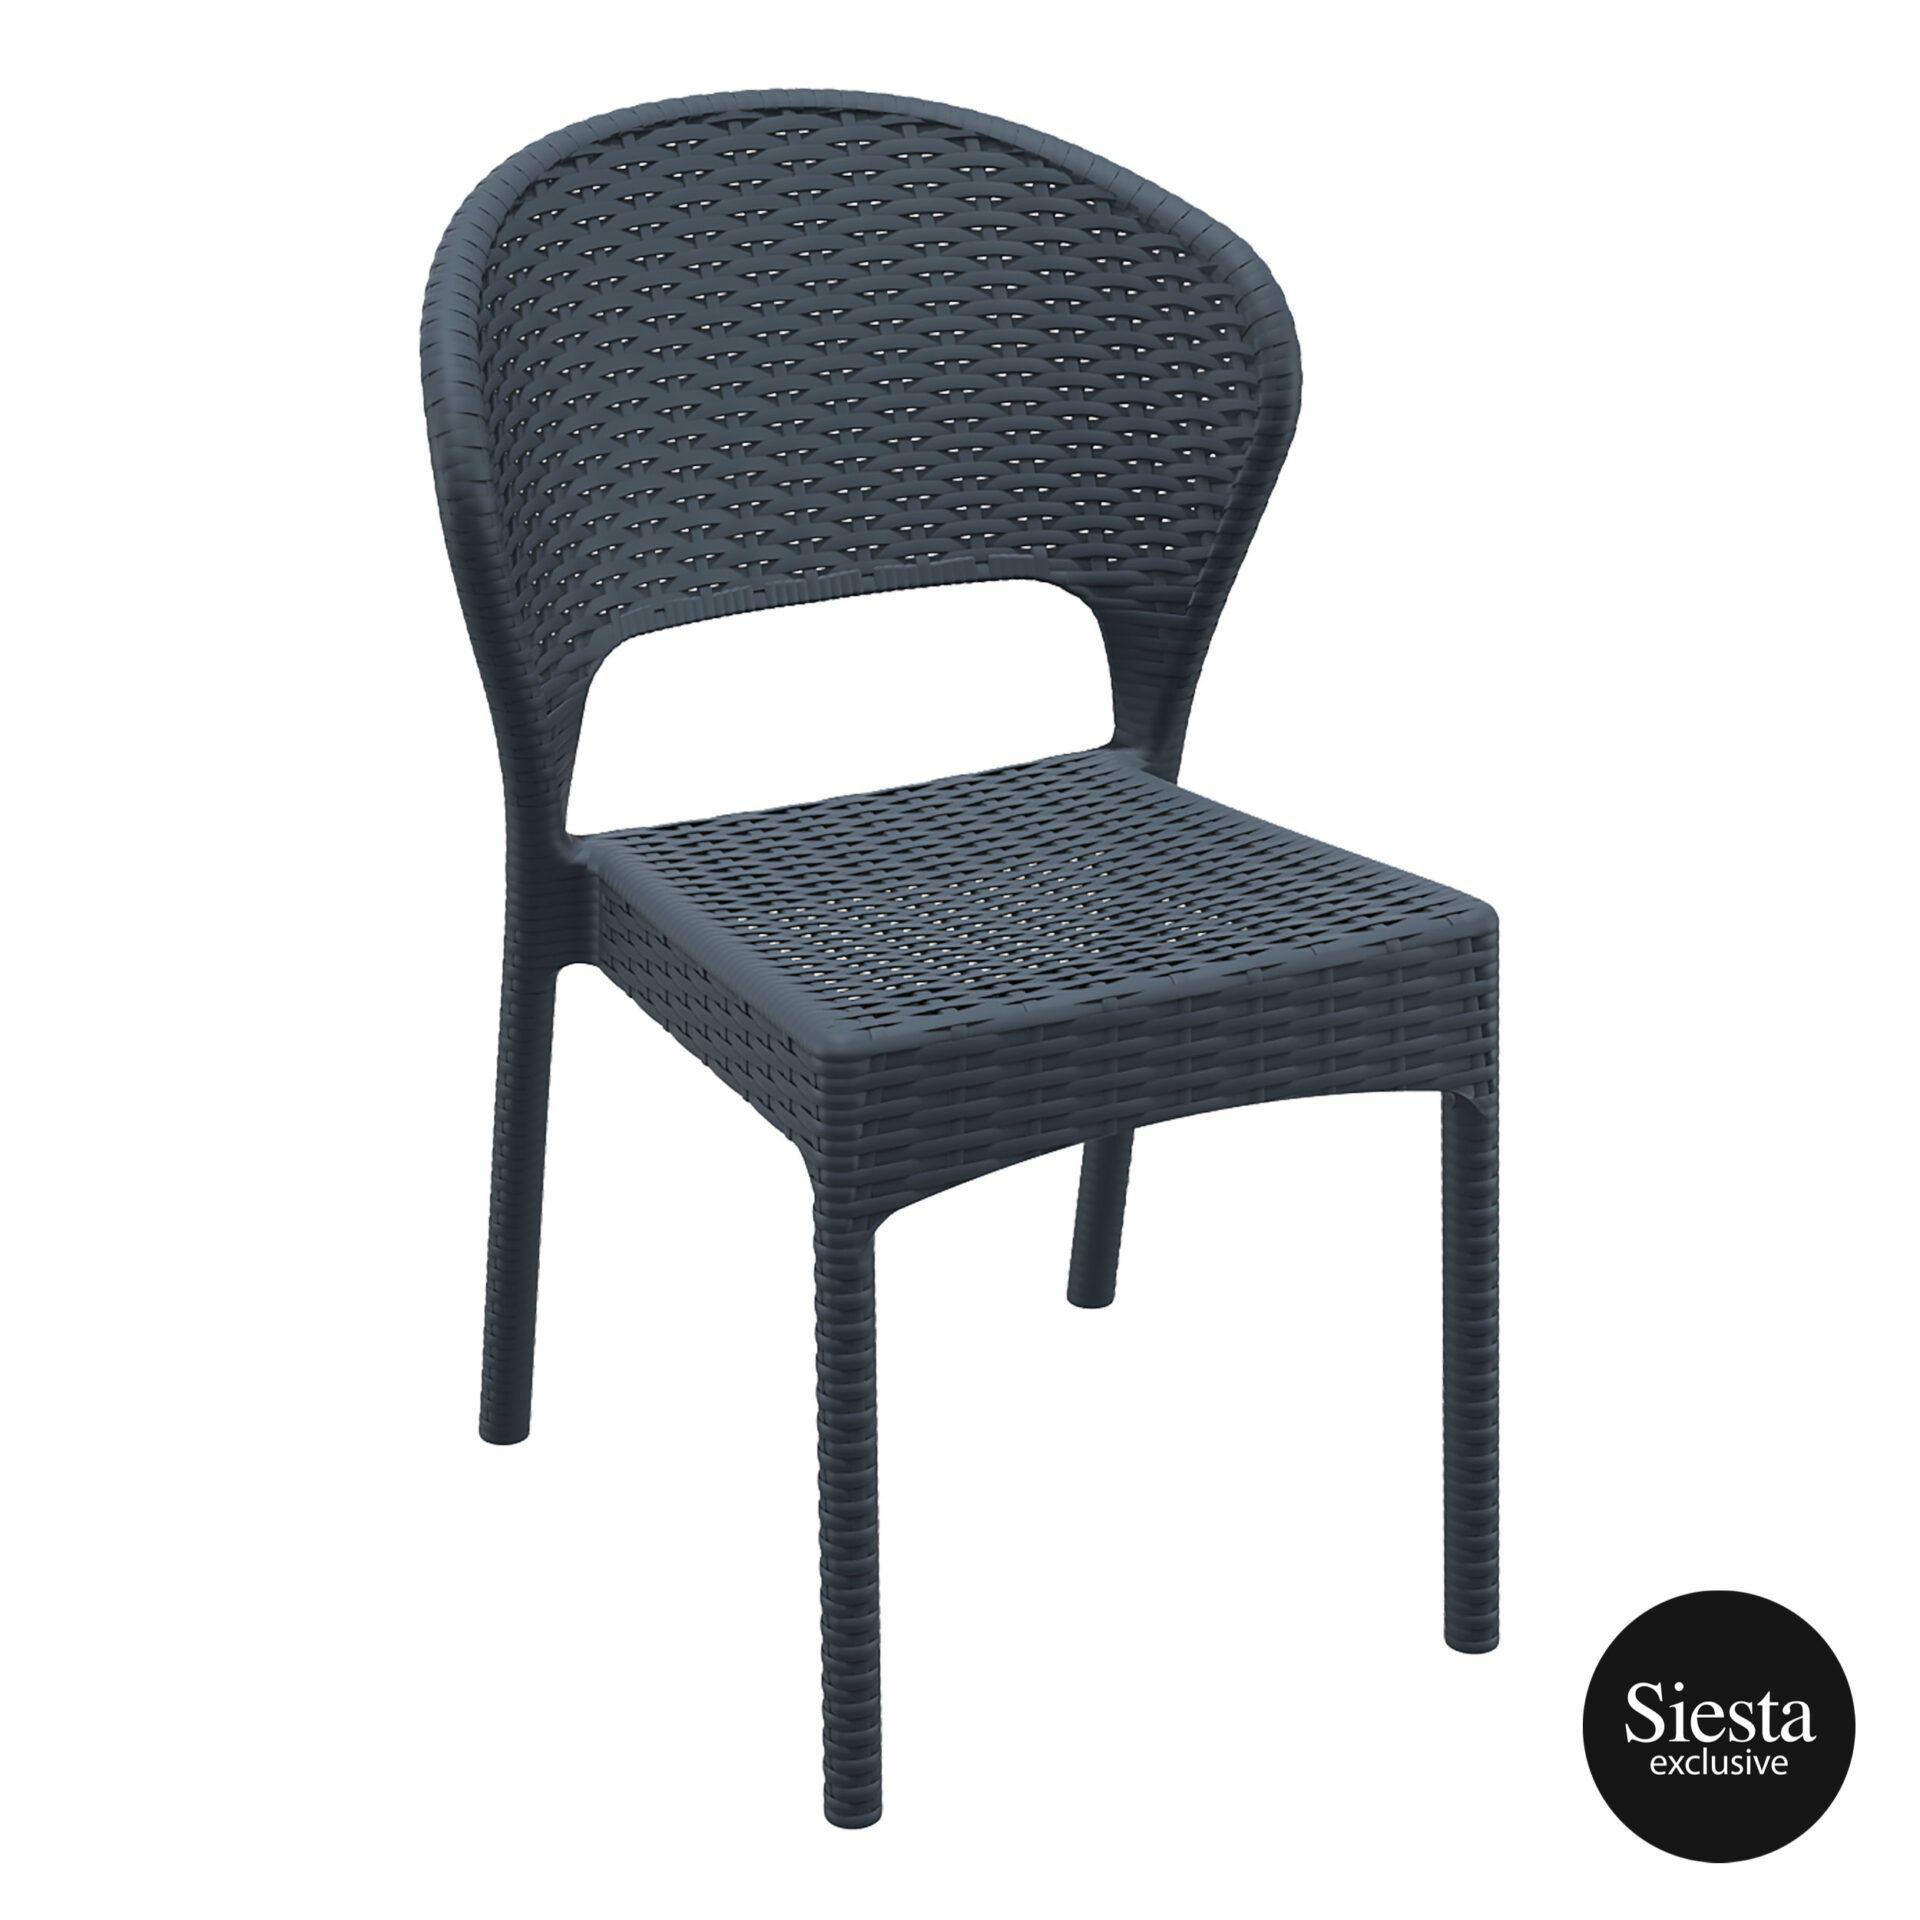 resin rattan outdoor daytona chair darkgrey front side